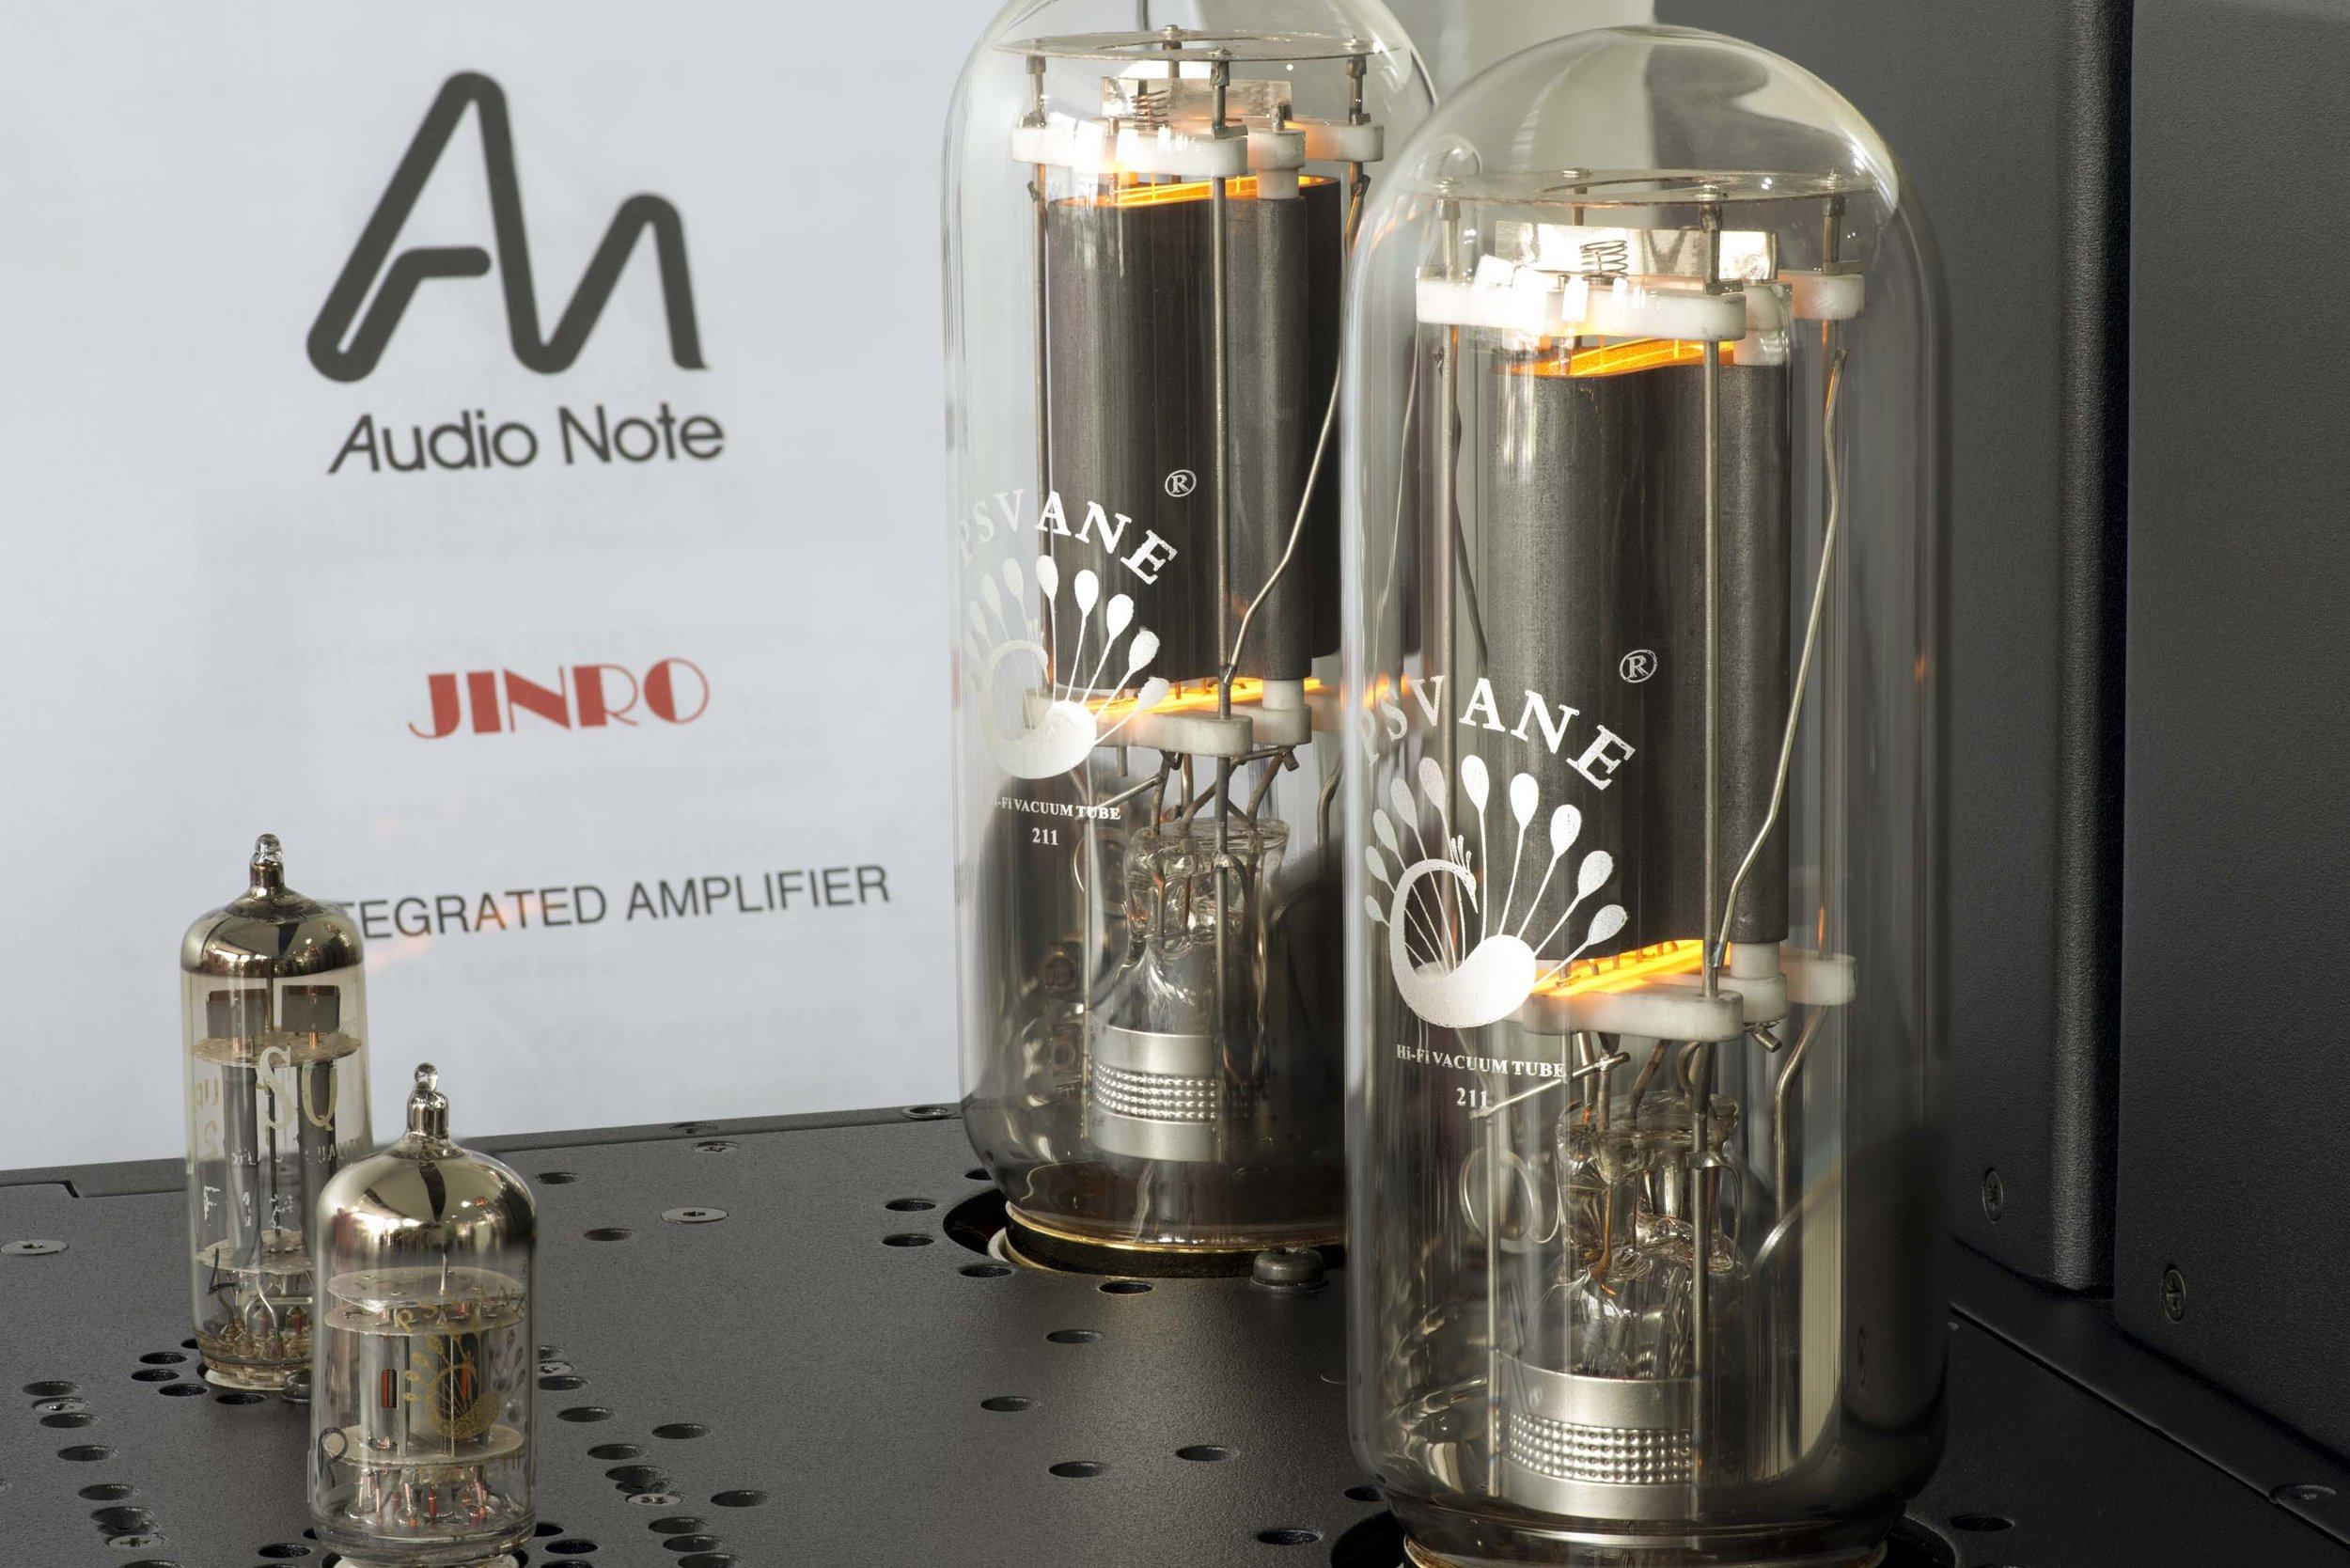 audio-note-jinro-integrated-amplifier-edinburgh.jpg